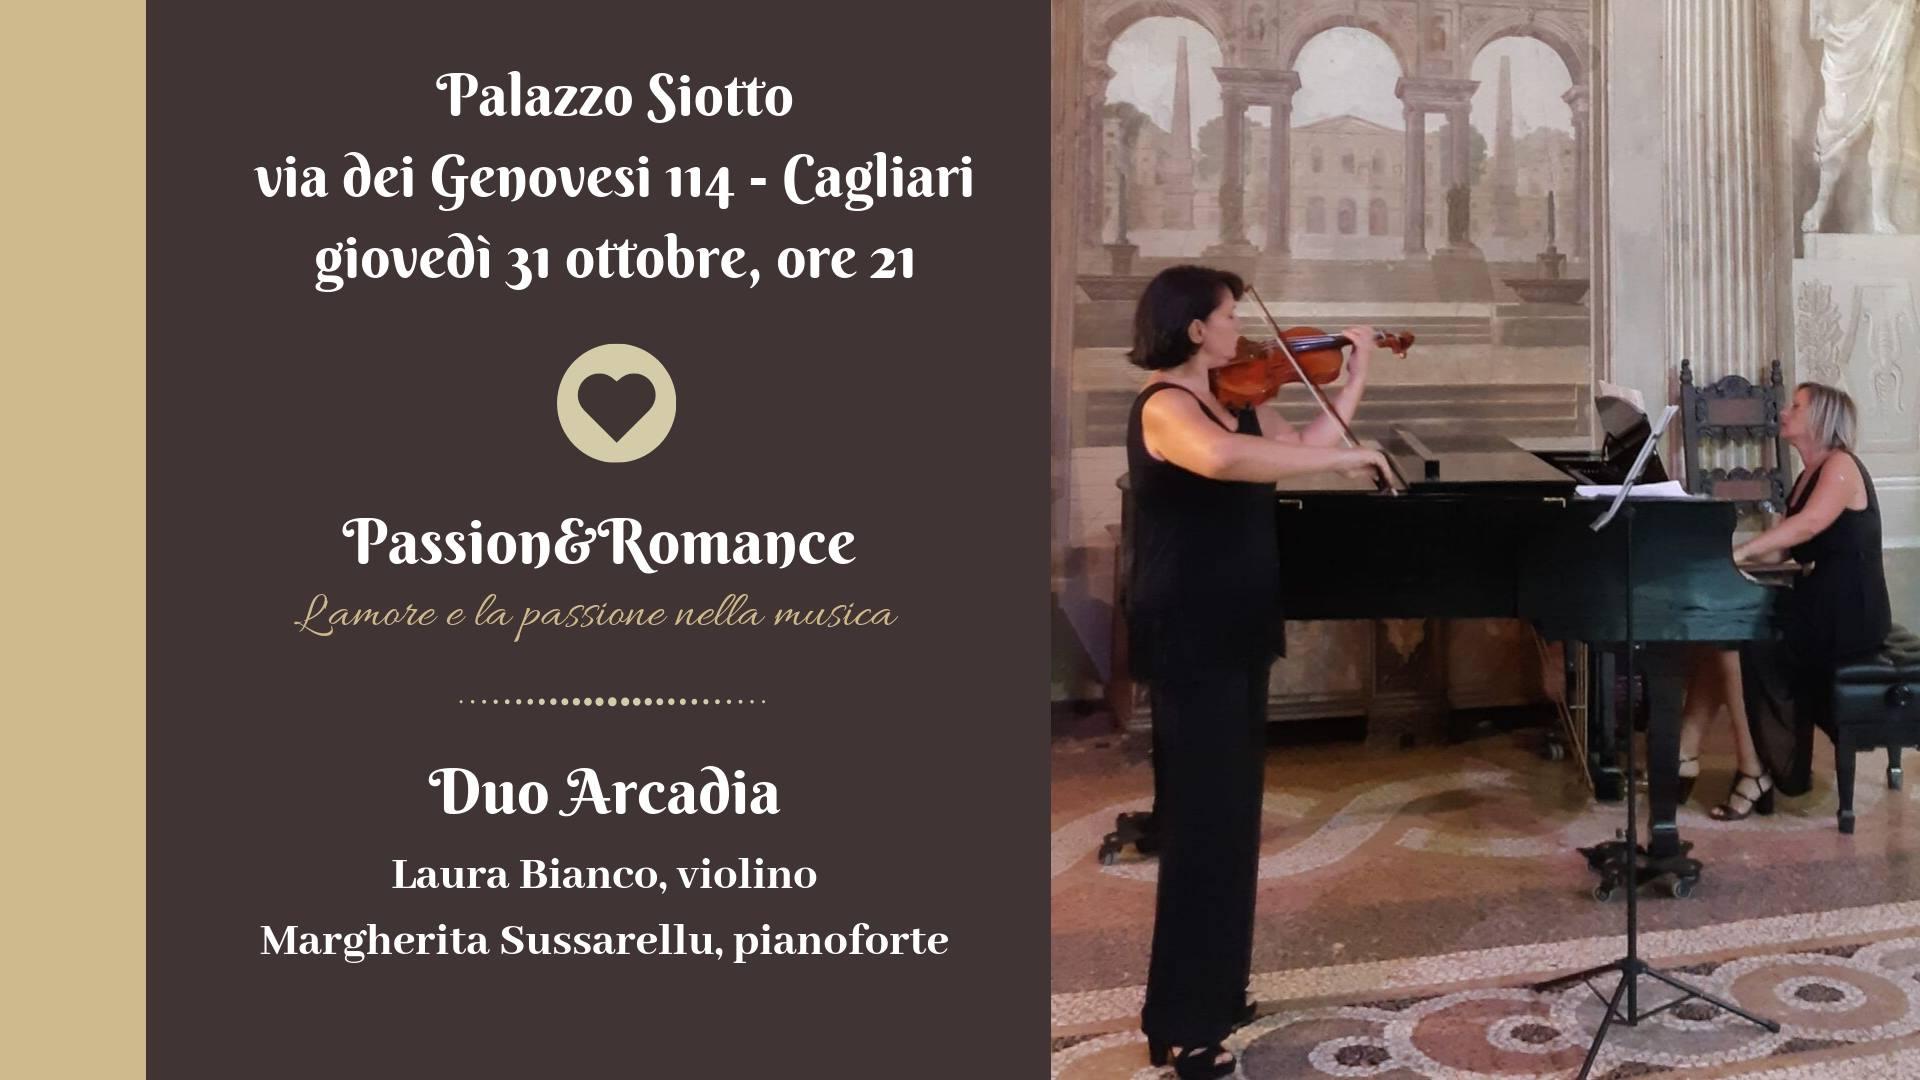 Passion&Romance